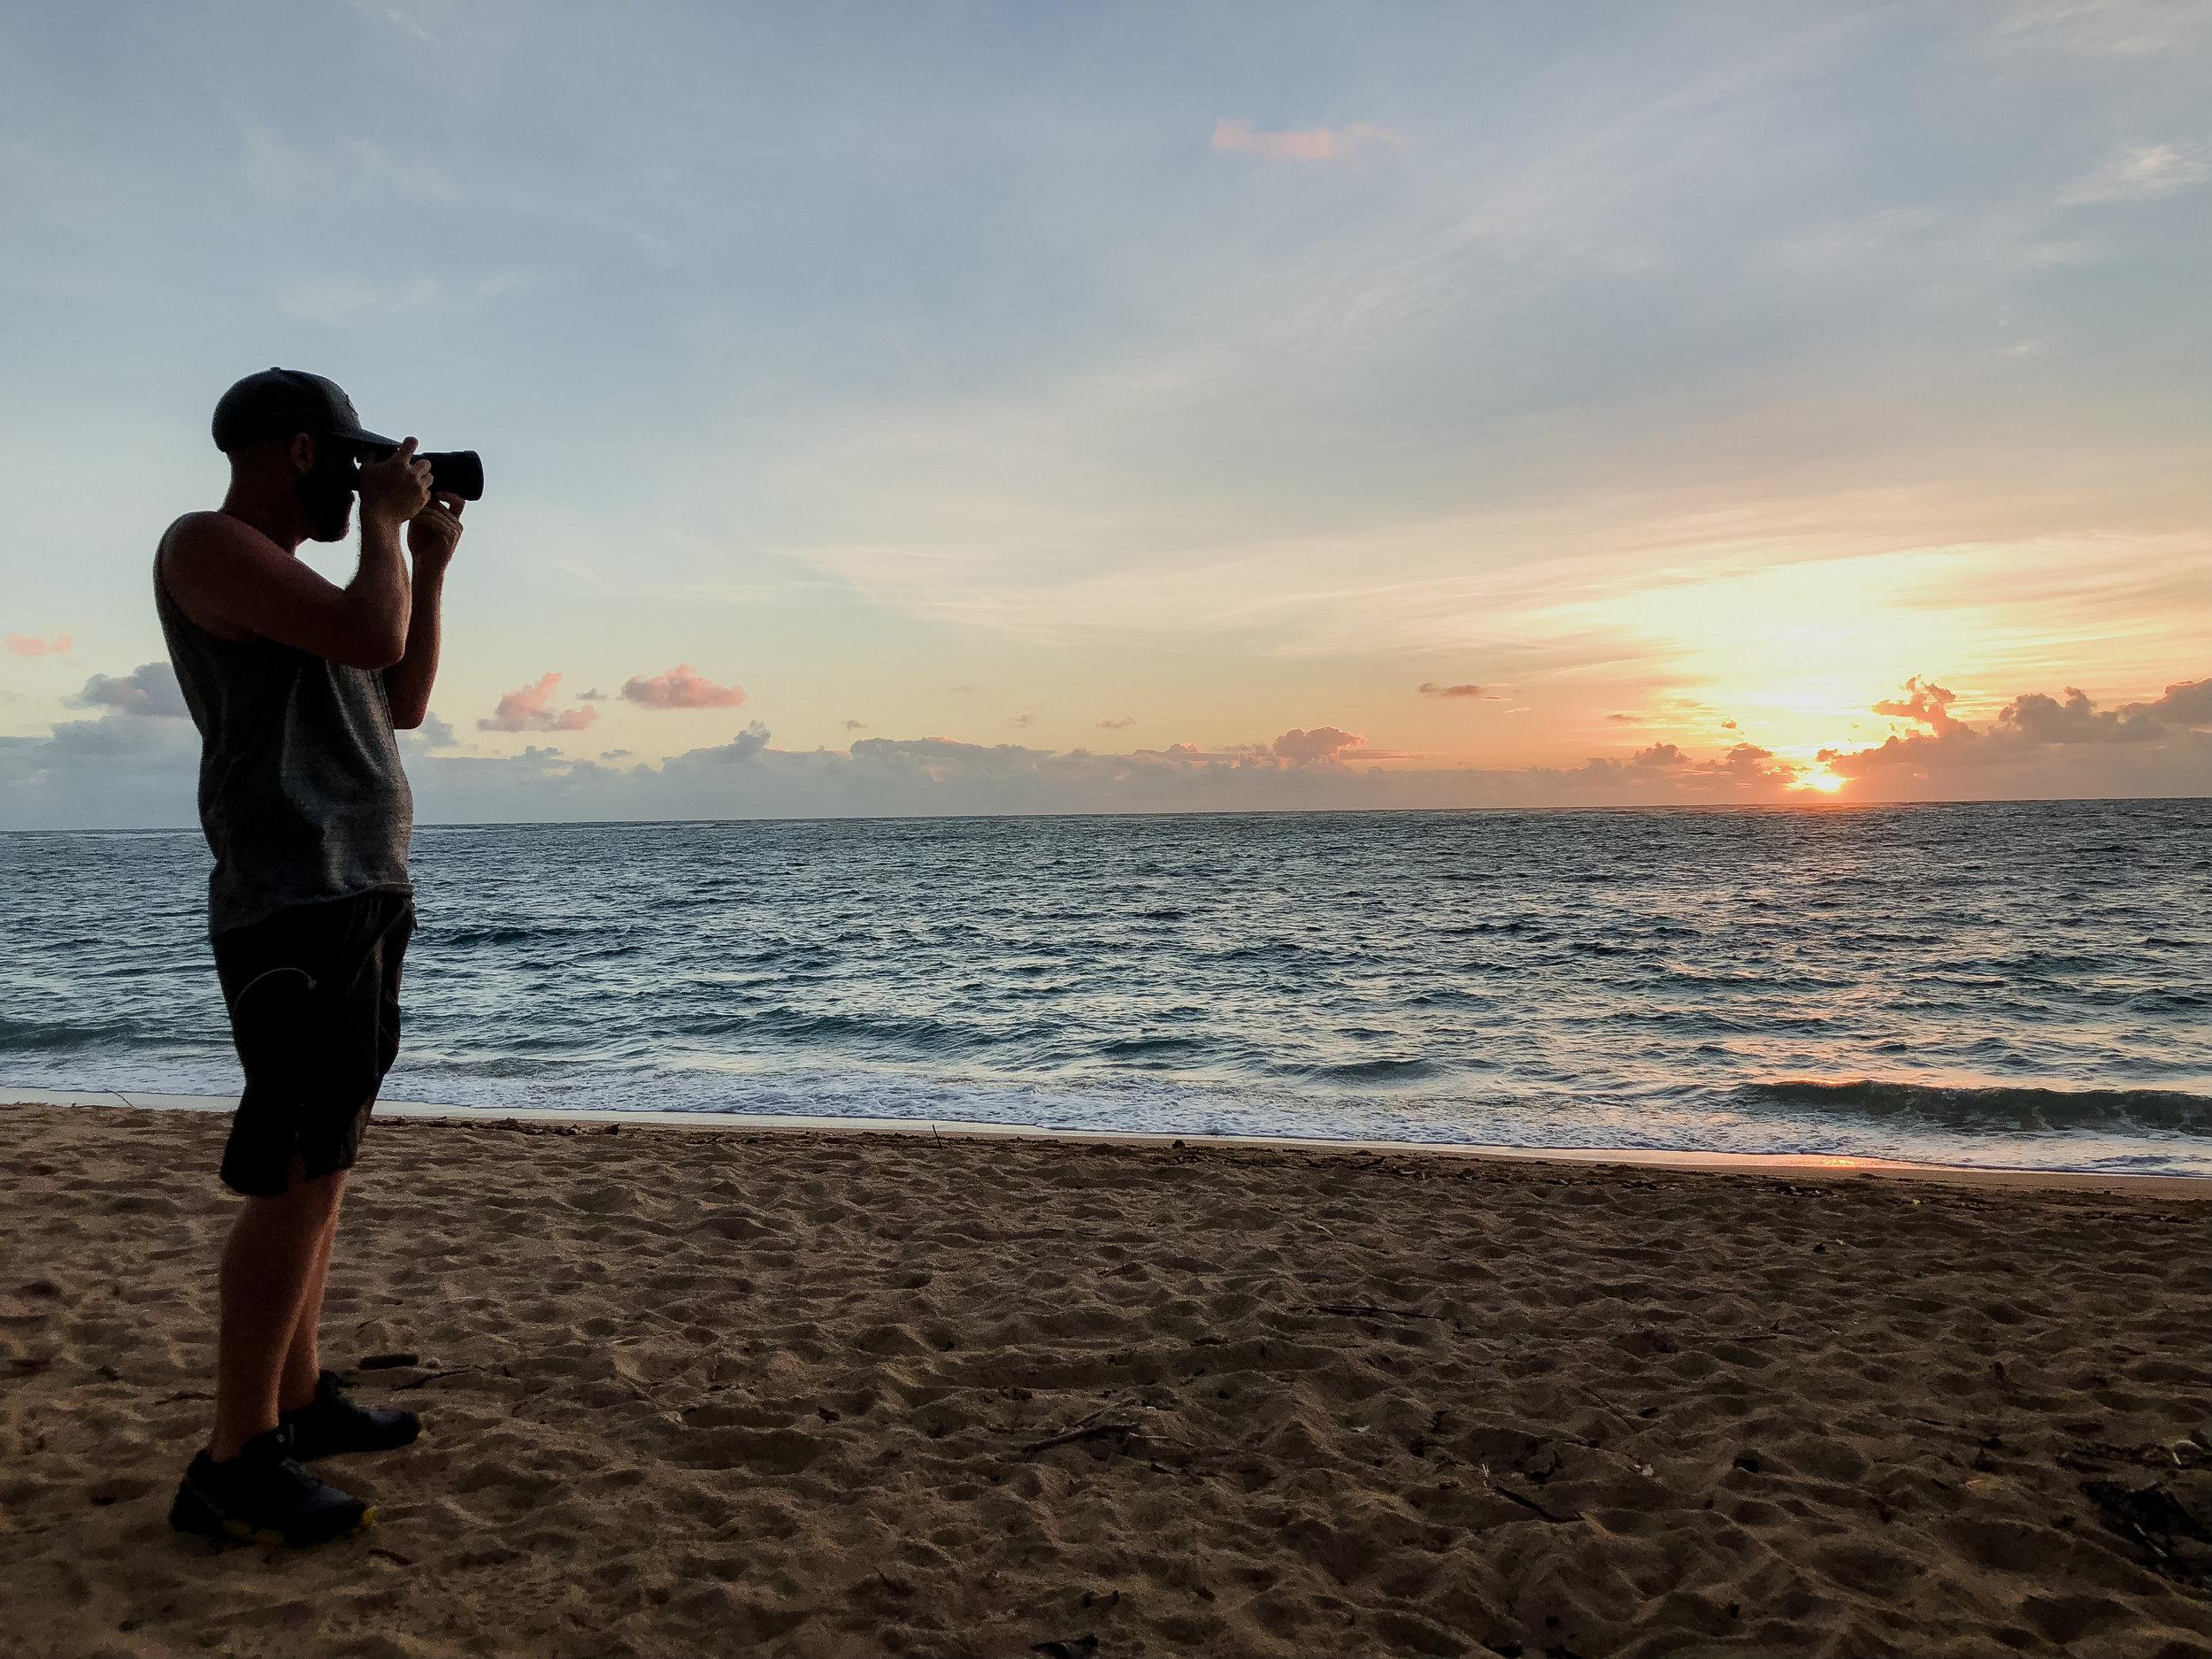 meagans hawaii pics-15.jpg